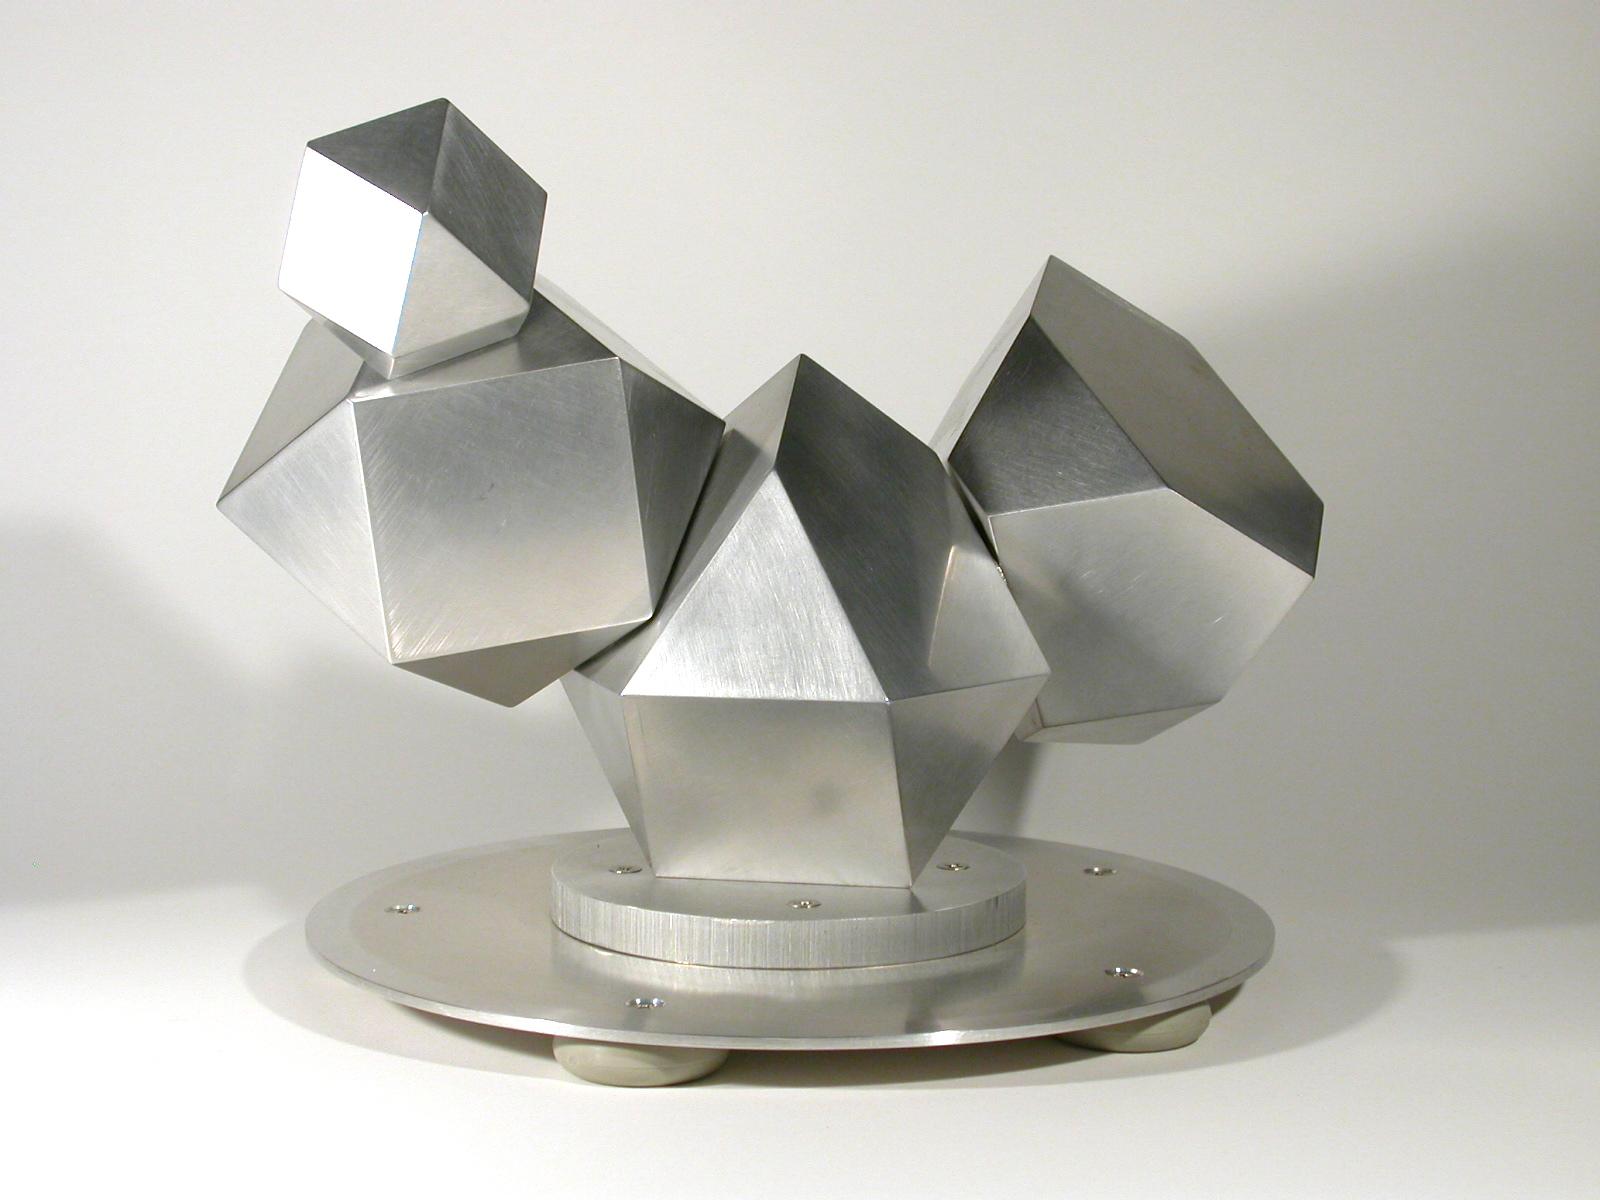 Two Halos Star Model, 2009